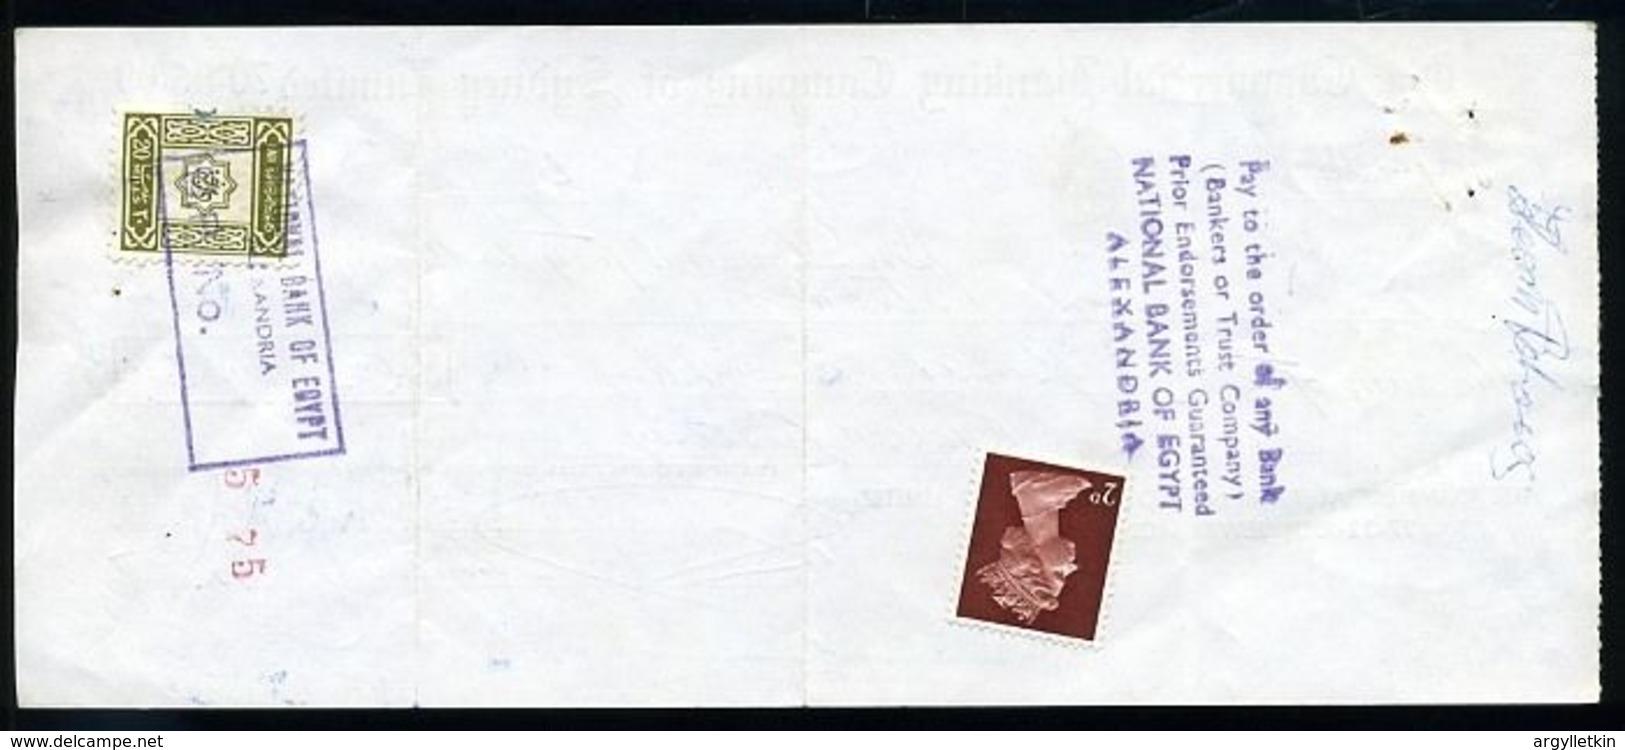 AUSTRALIA GB EGYPT CHEQUE 1969 - Cheques & Traveler's Cheques